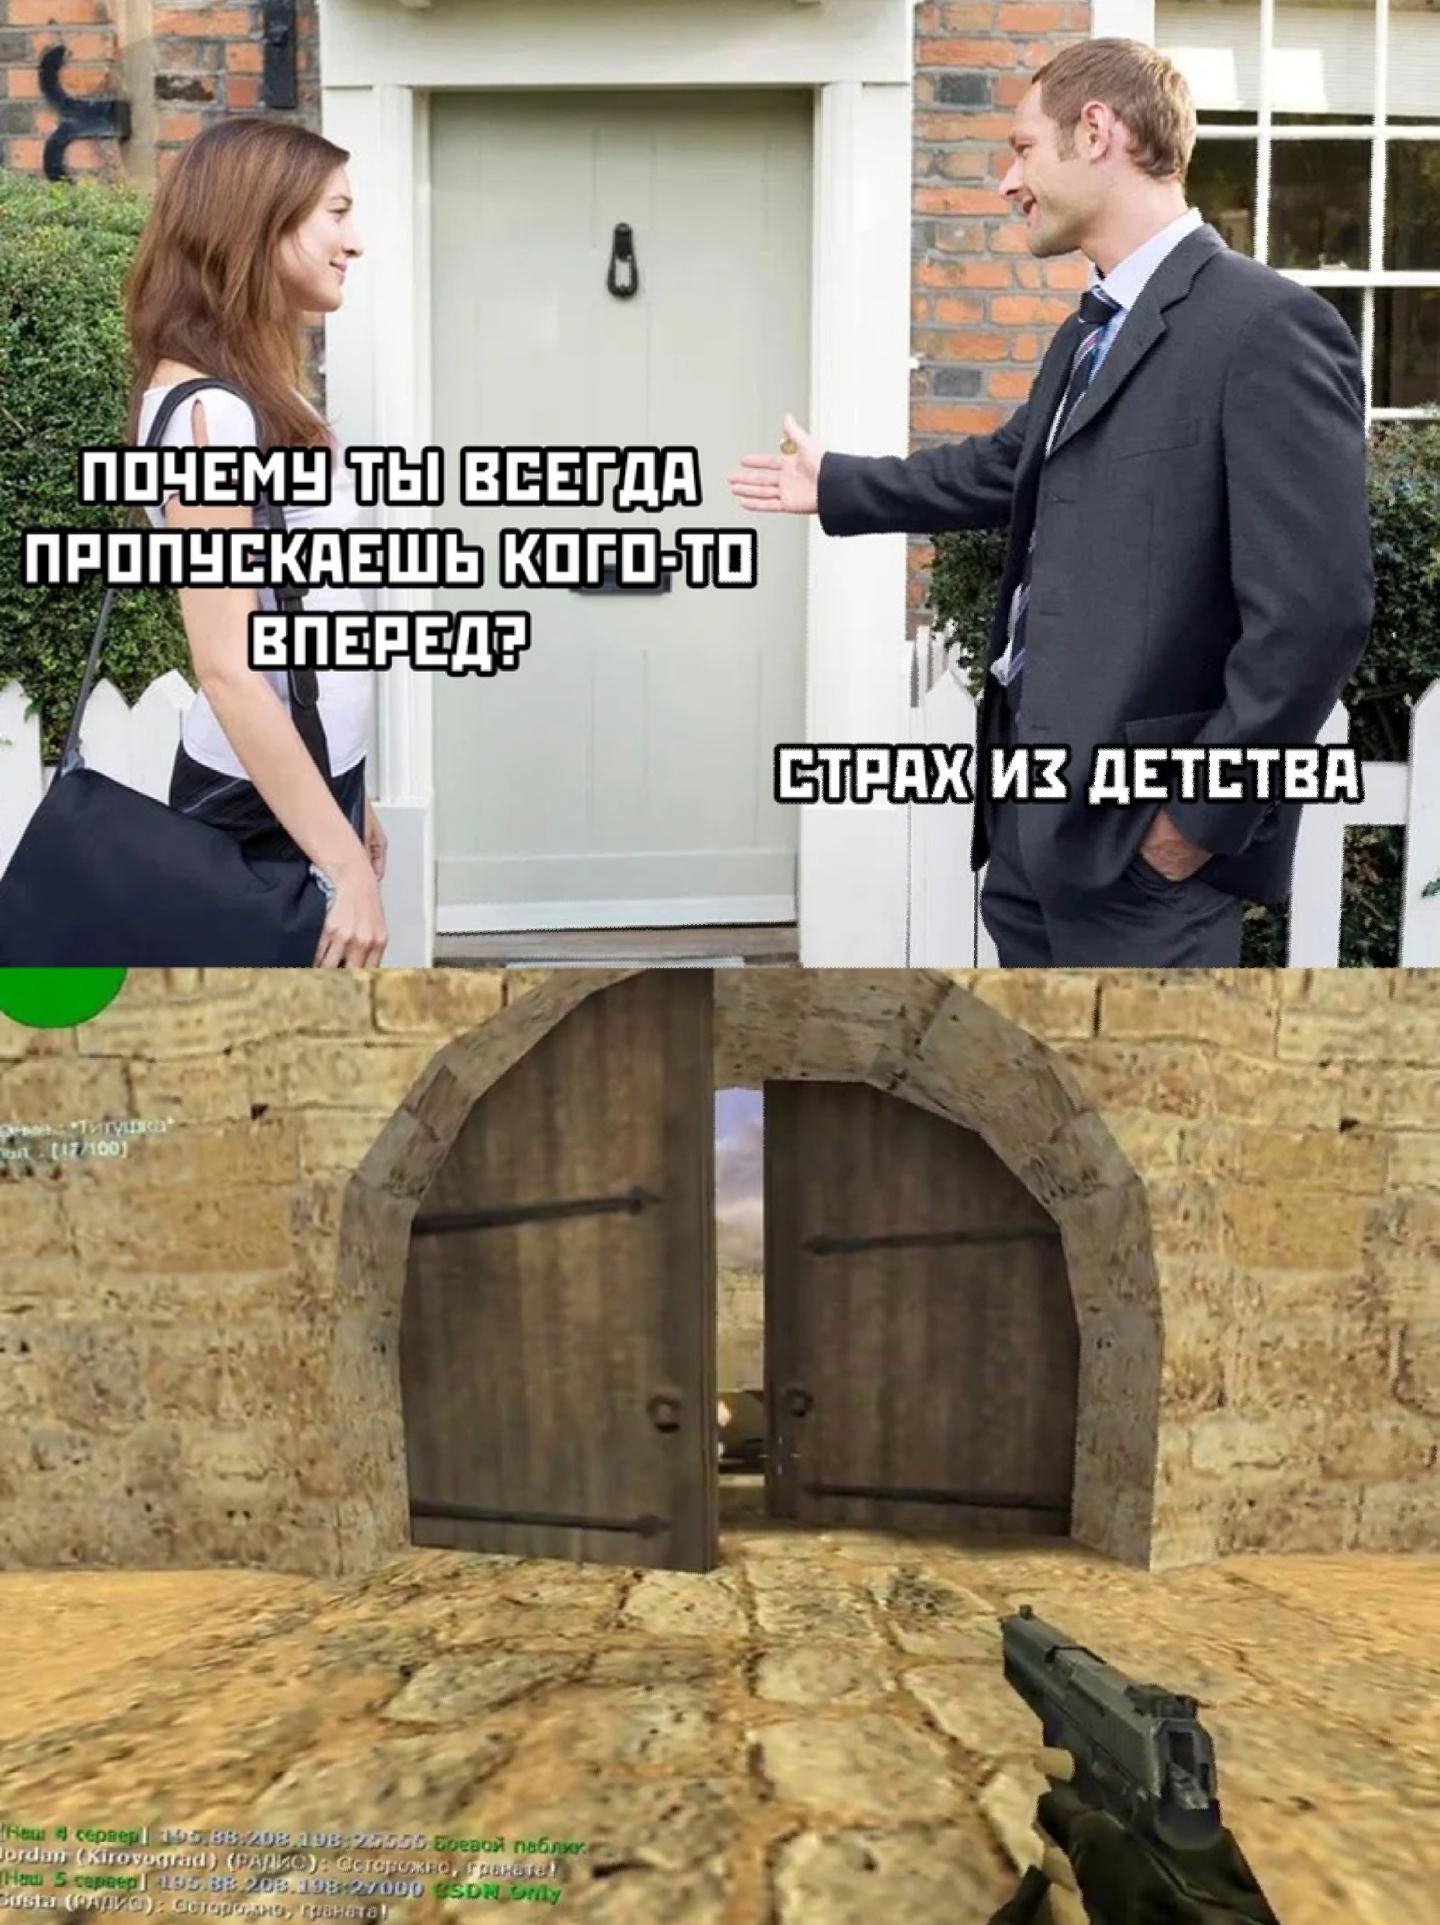 https://cs11.pikabu.ru/post_img/big/2020/01/20/5/1579503572178922082.png